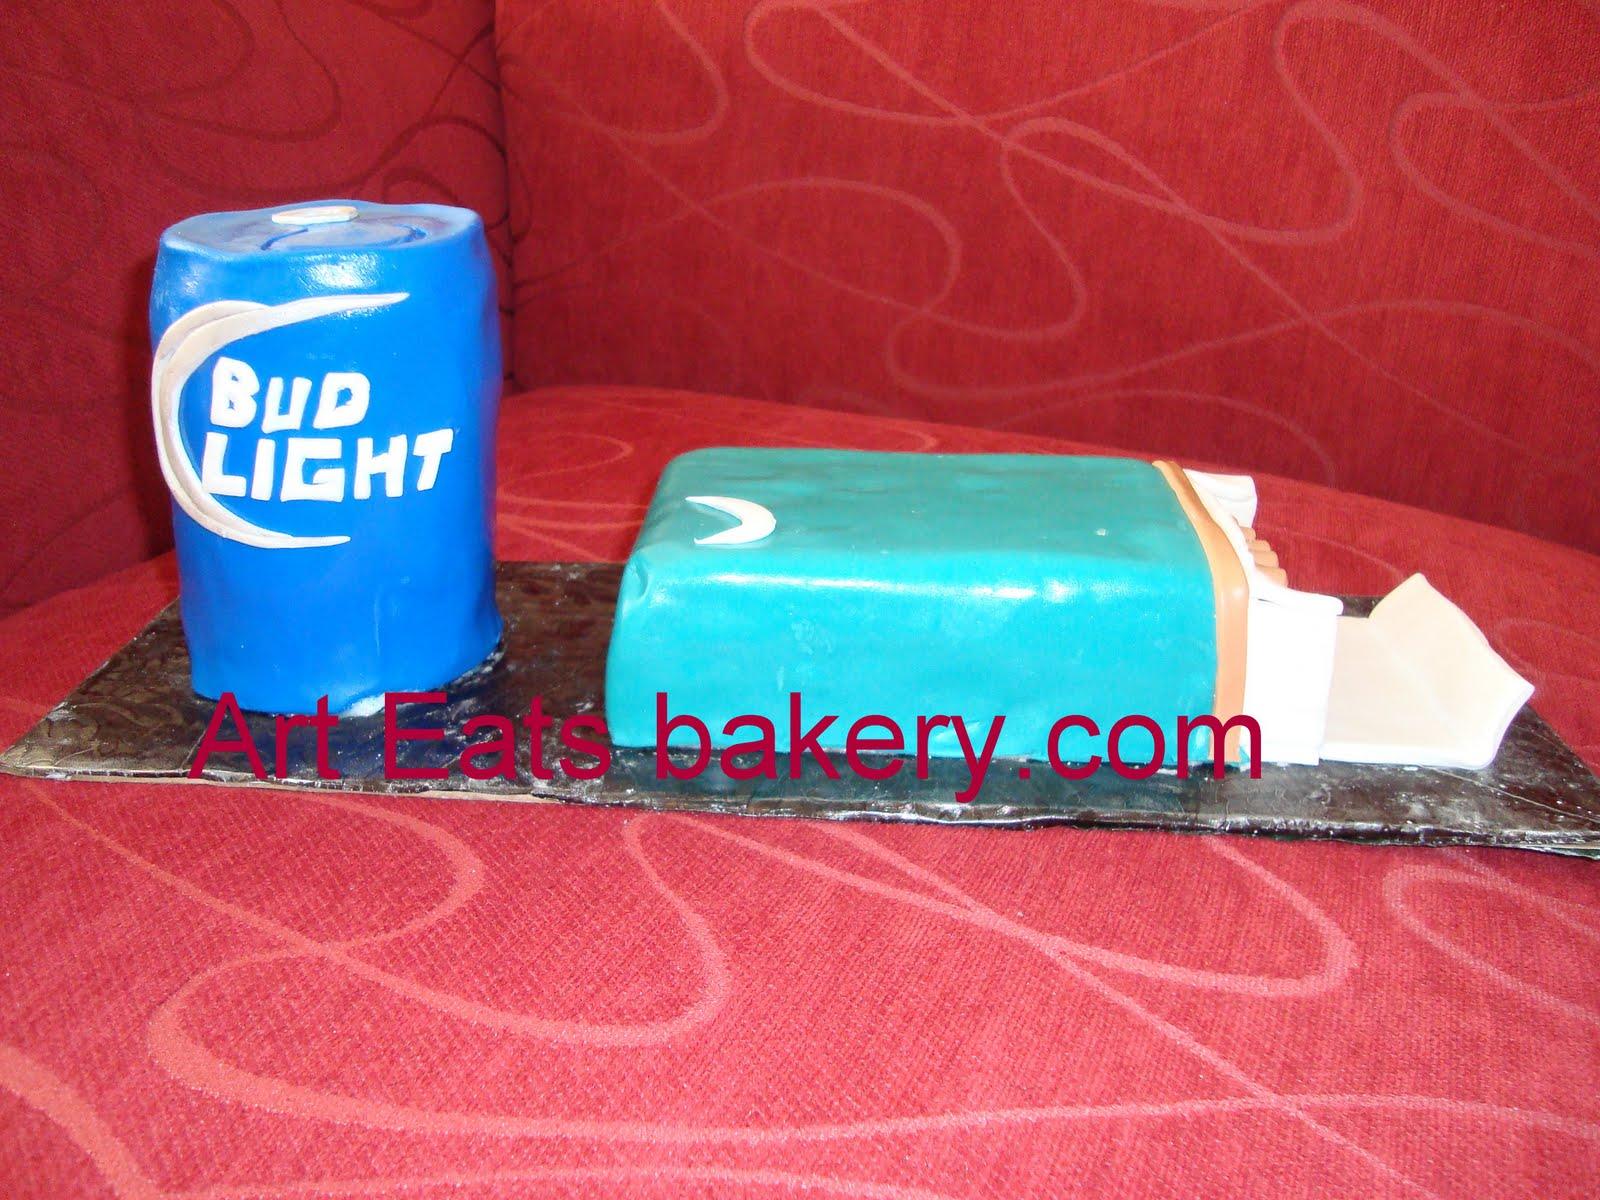 Fantastic 3D Bud Light Beer Can And Newports Birthday Cake Arteatsbakery Funny Birthday Cards Online Elaedamsfinfo